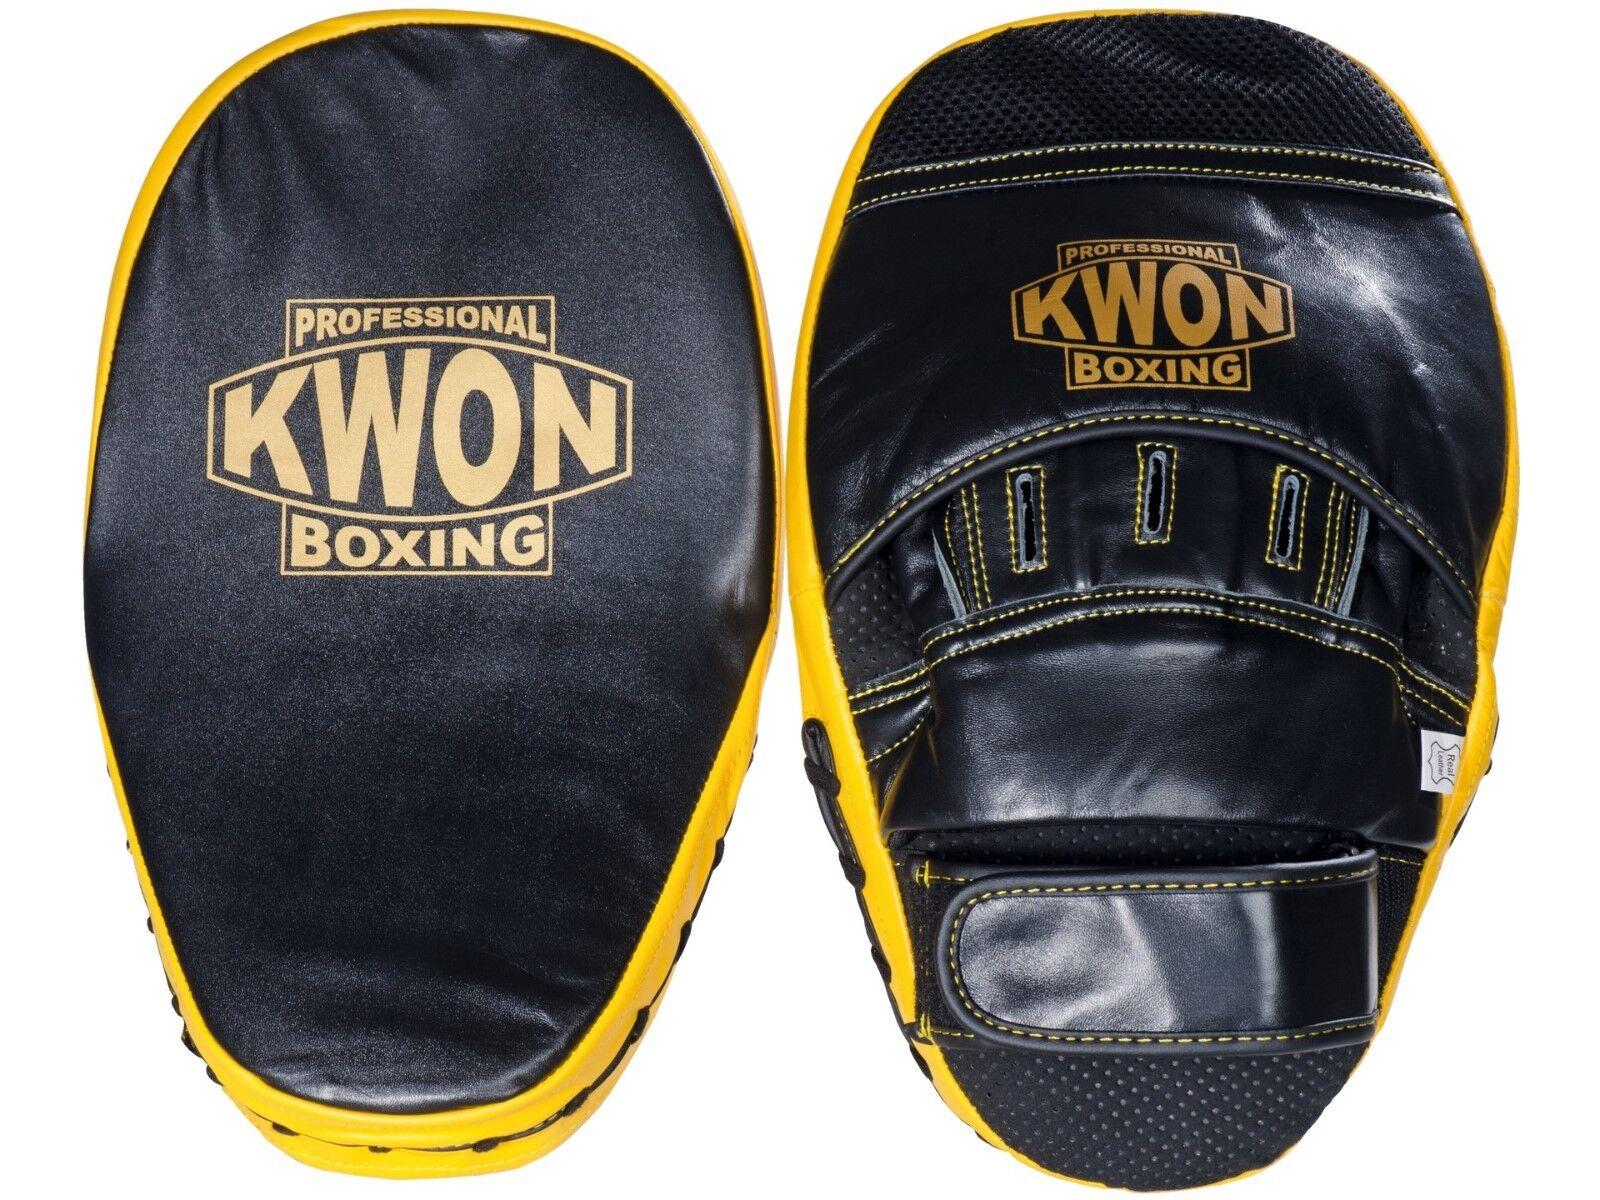 Kwon Doppelpratze Leder.  Boxen, Training, Kampfsport, MMA, Muay Thai,